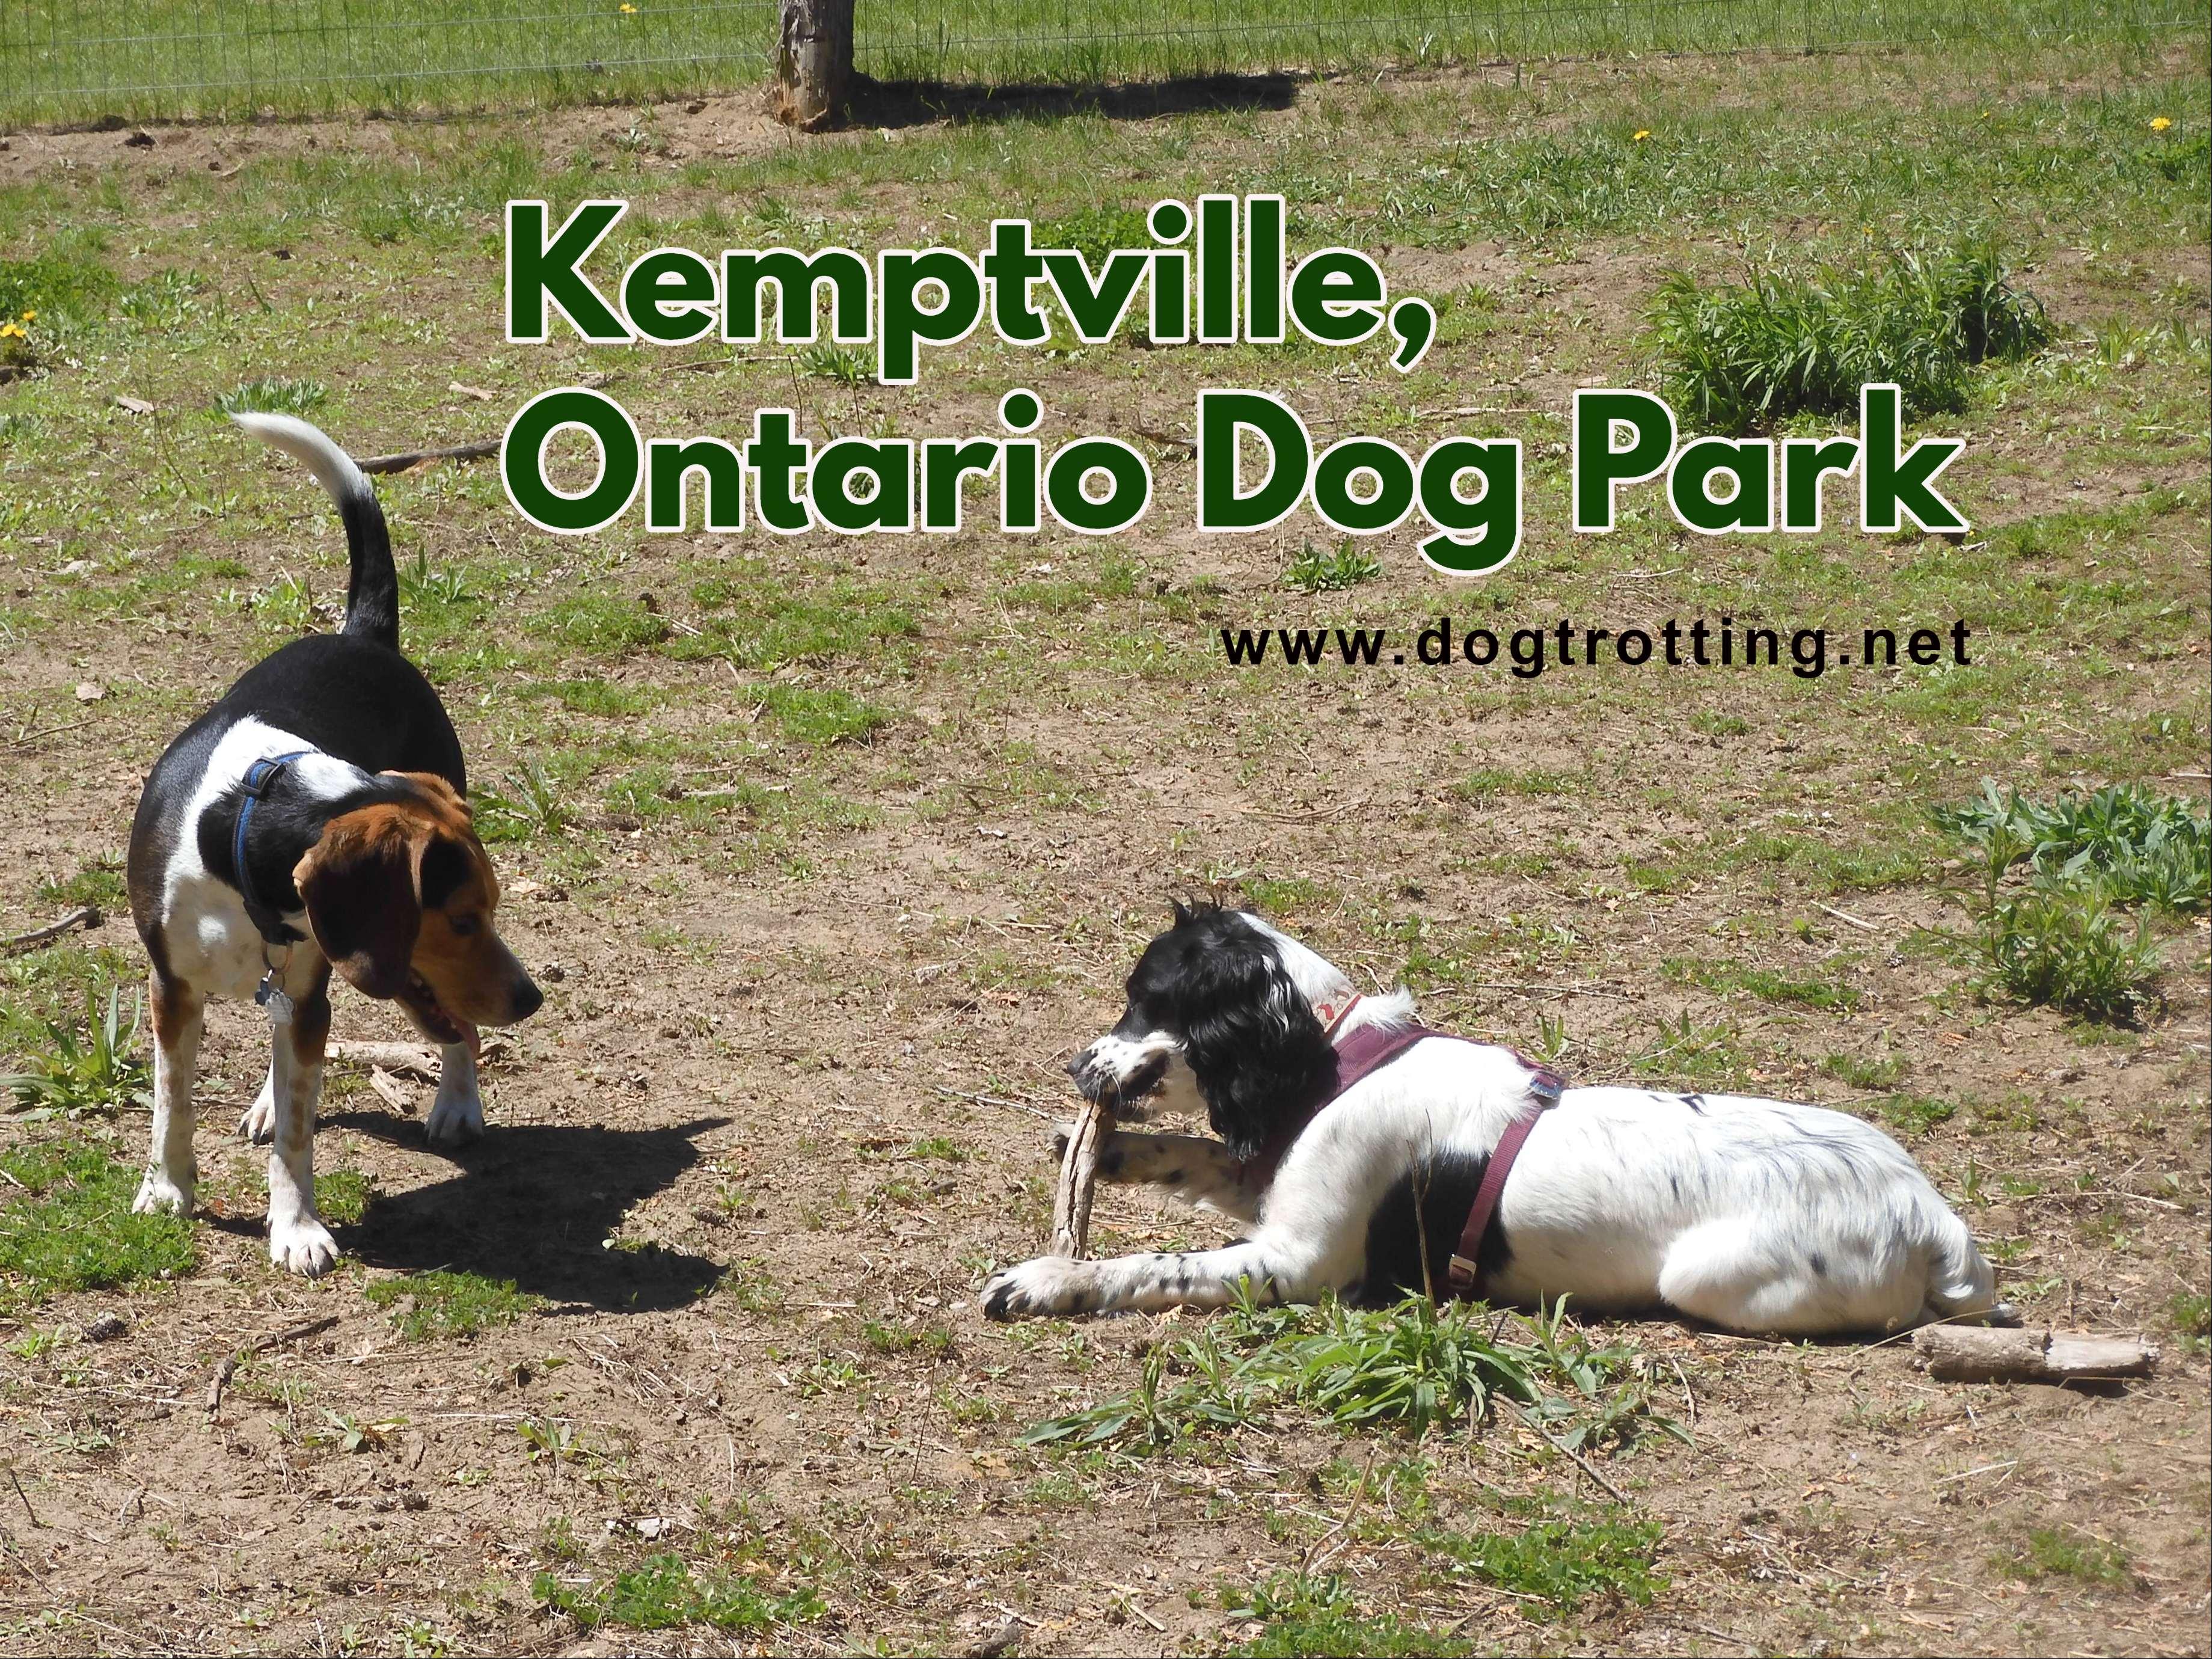 Dog at Ferguson Forest Leash Free Dog Park in Kemptville Ontario